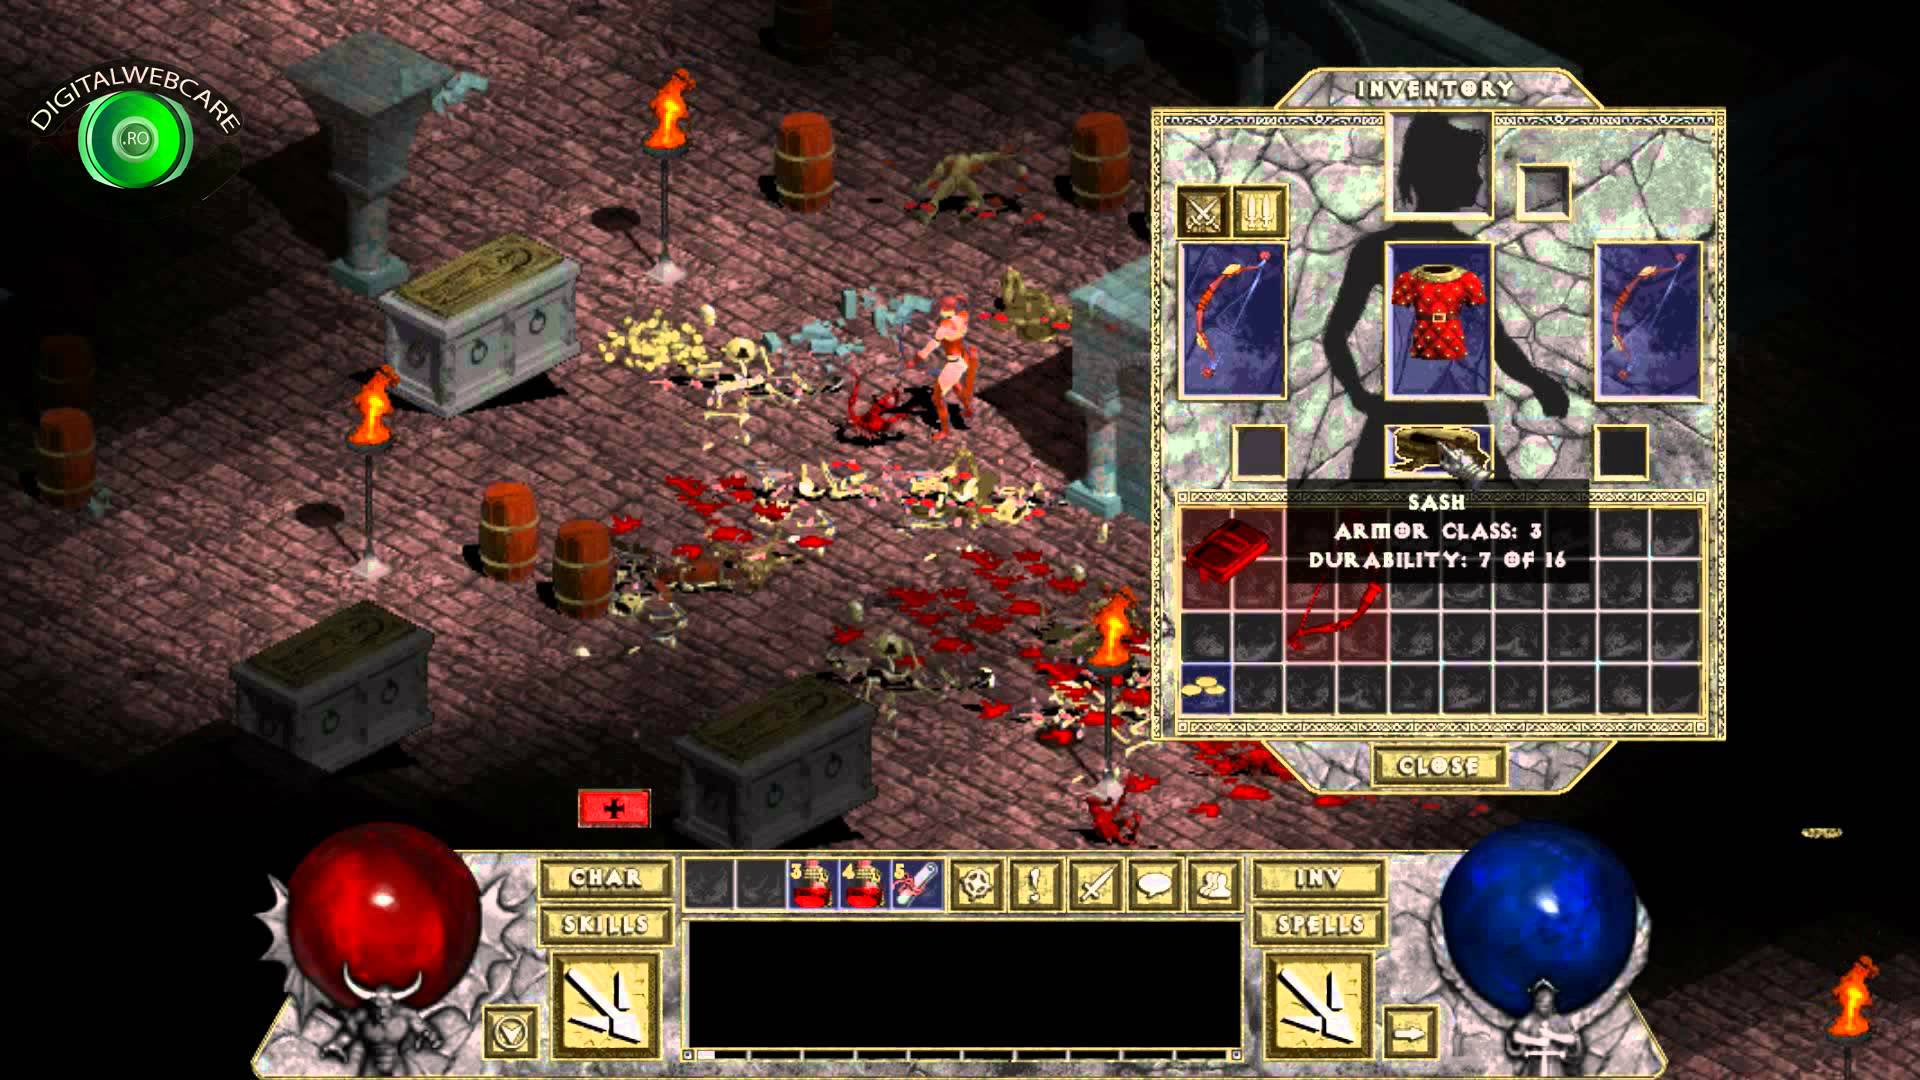 Diablo 1 HD Patch-Diablo 1 HD Gameplay-Diablo 1 High Resolution Patch